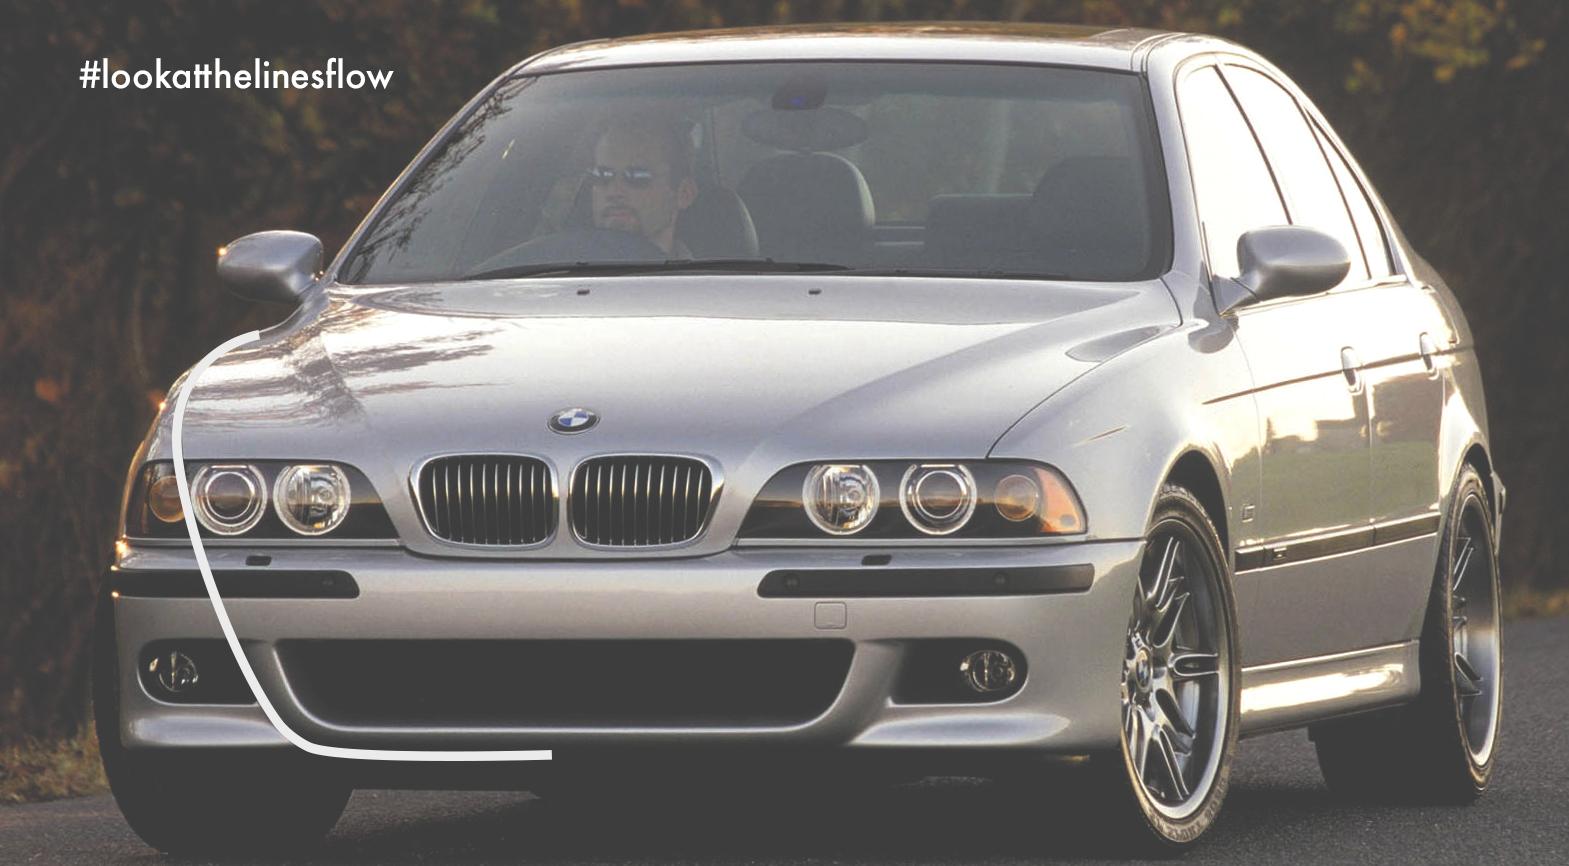 Mömus BMW E39 m sport pack Facelift fl bumper front headlights line flow